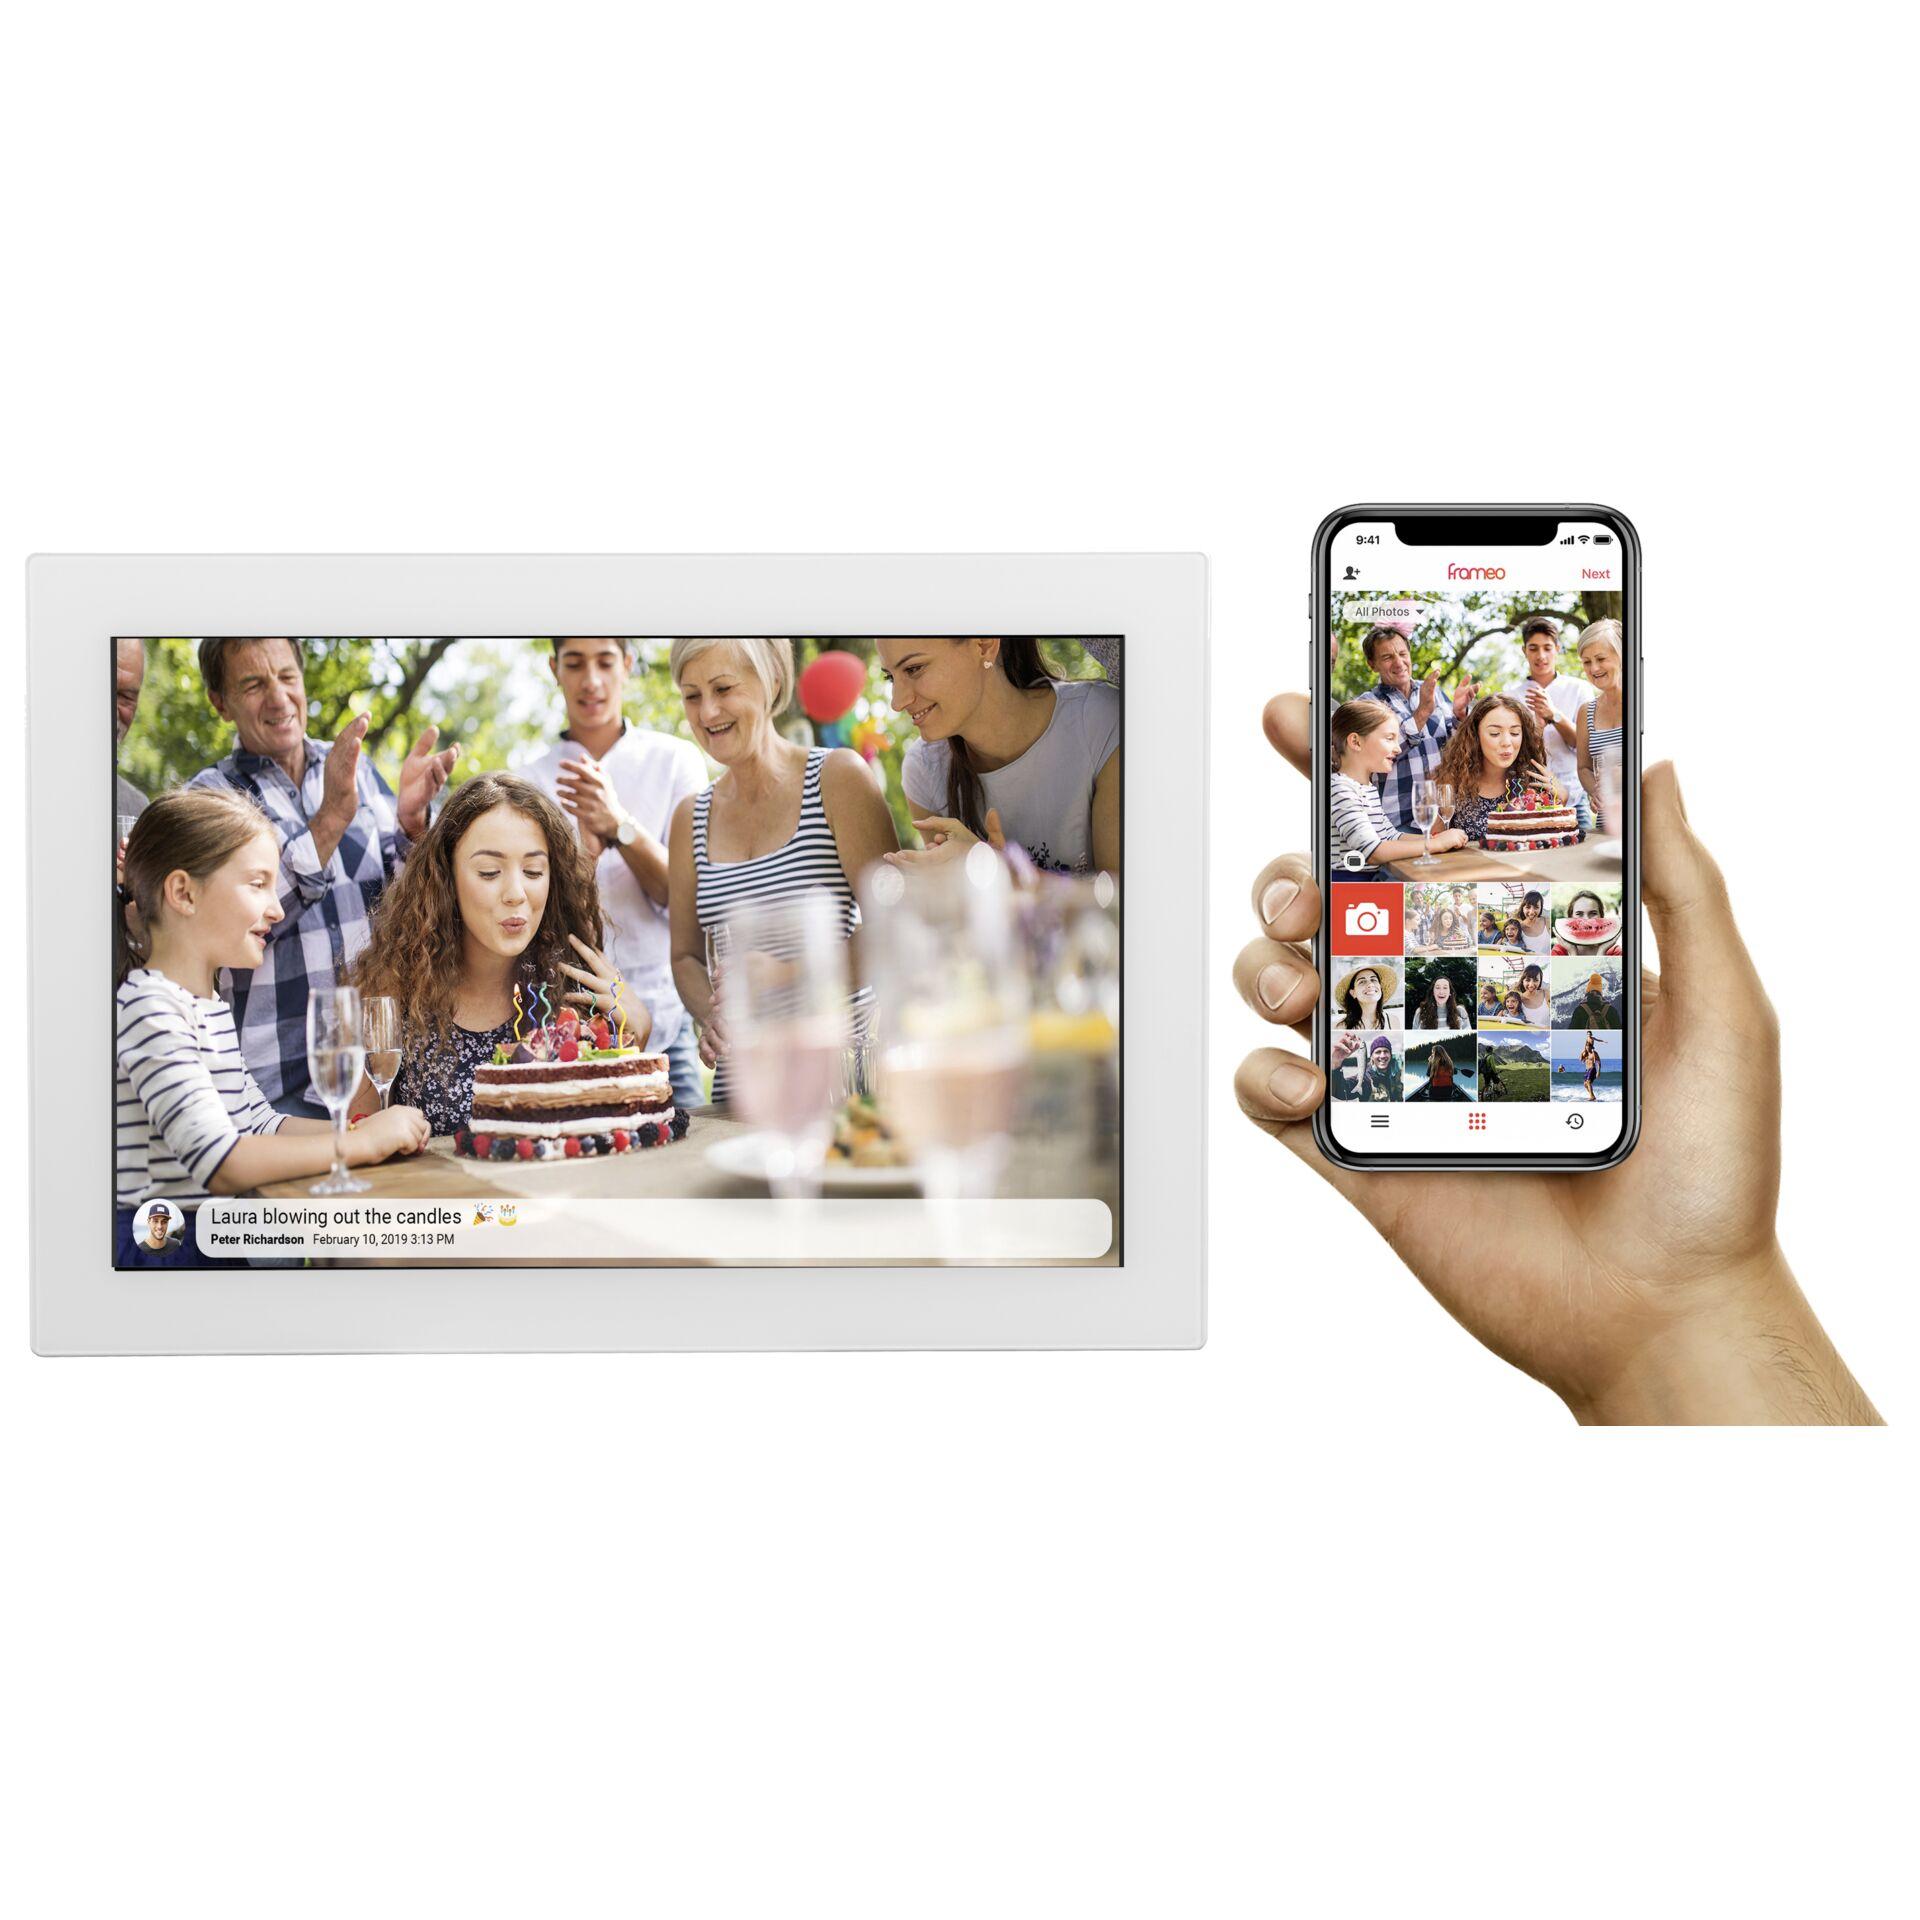 Denver PFF-1017 white (10.1 inch) 16GB